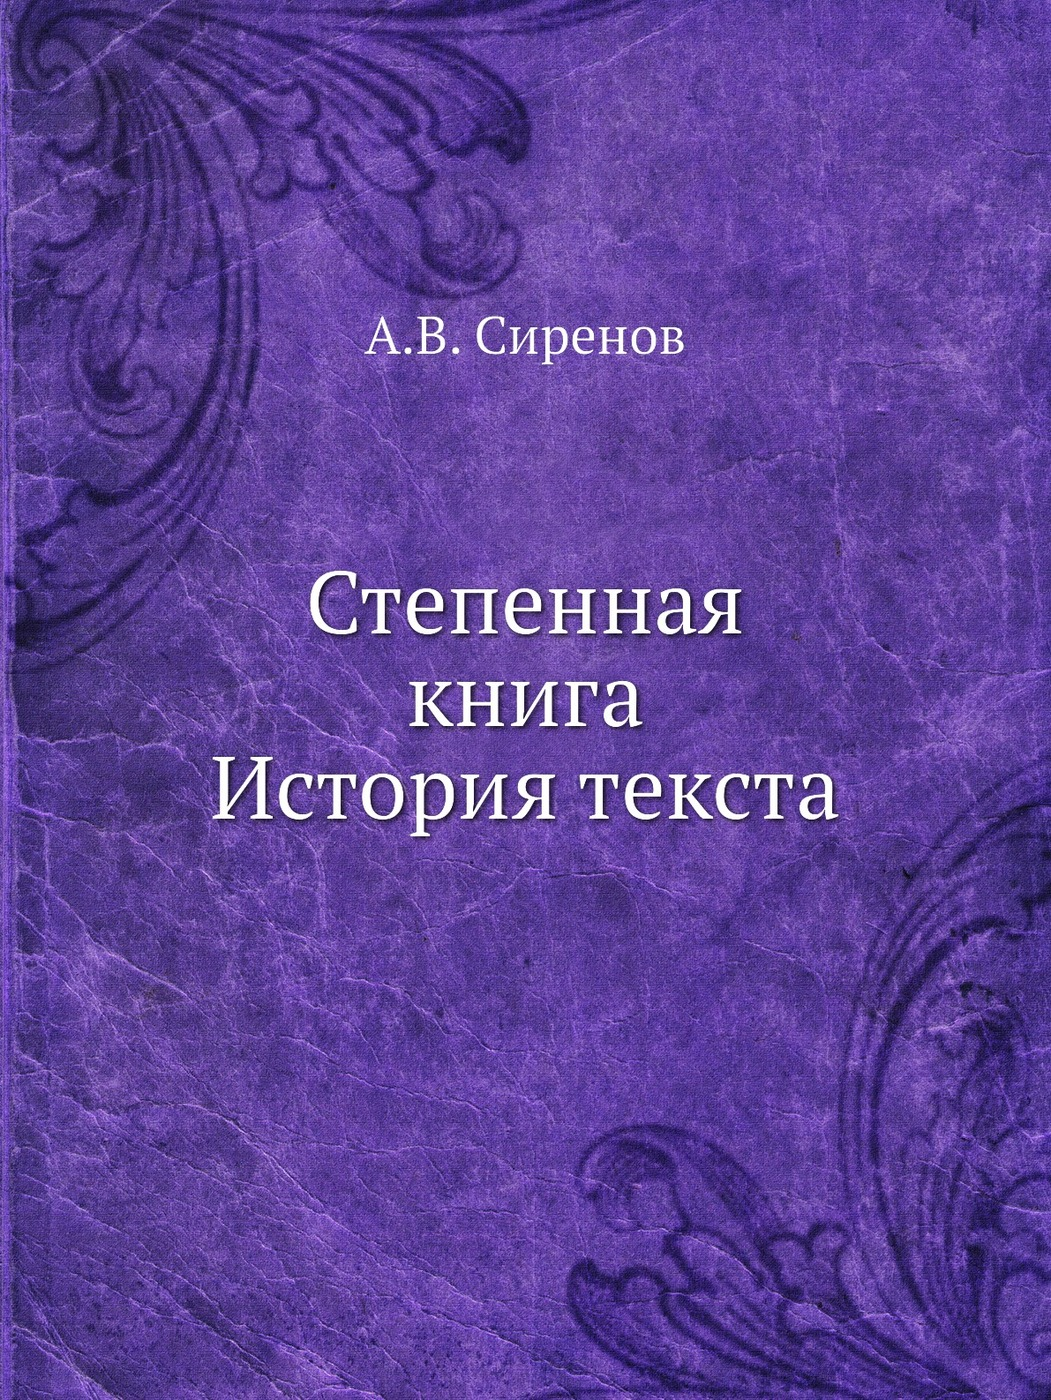 А.В. Сиренов Степенная книга. История текста